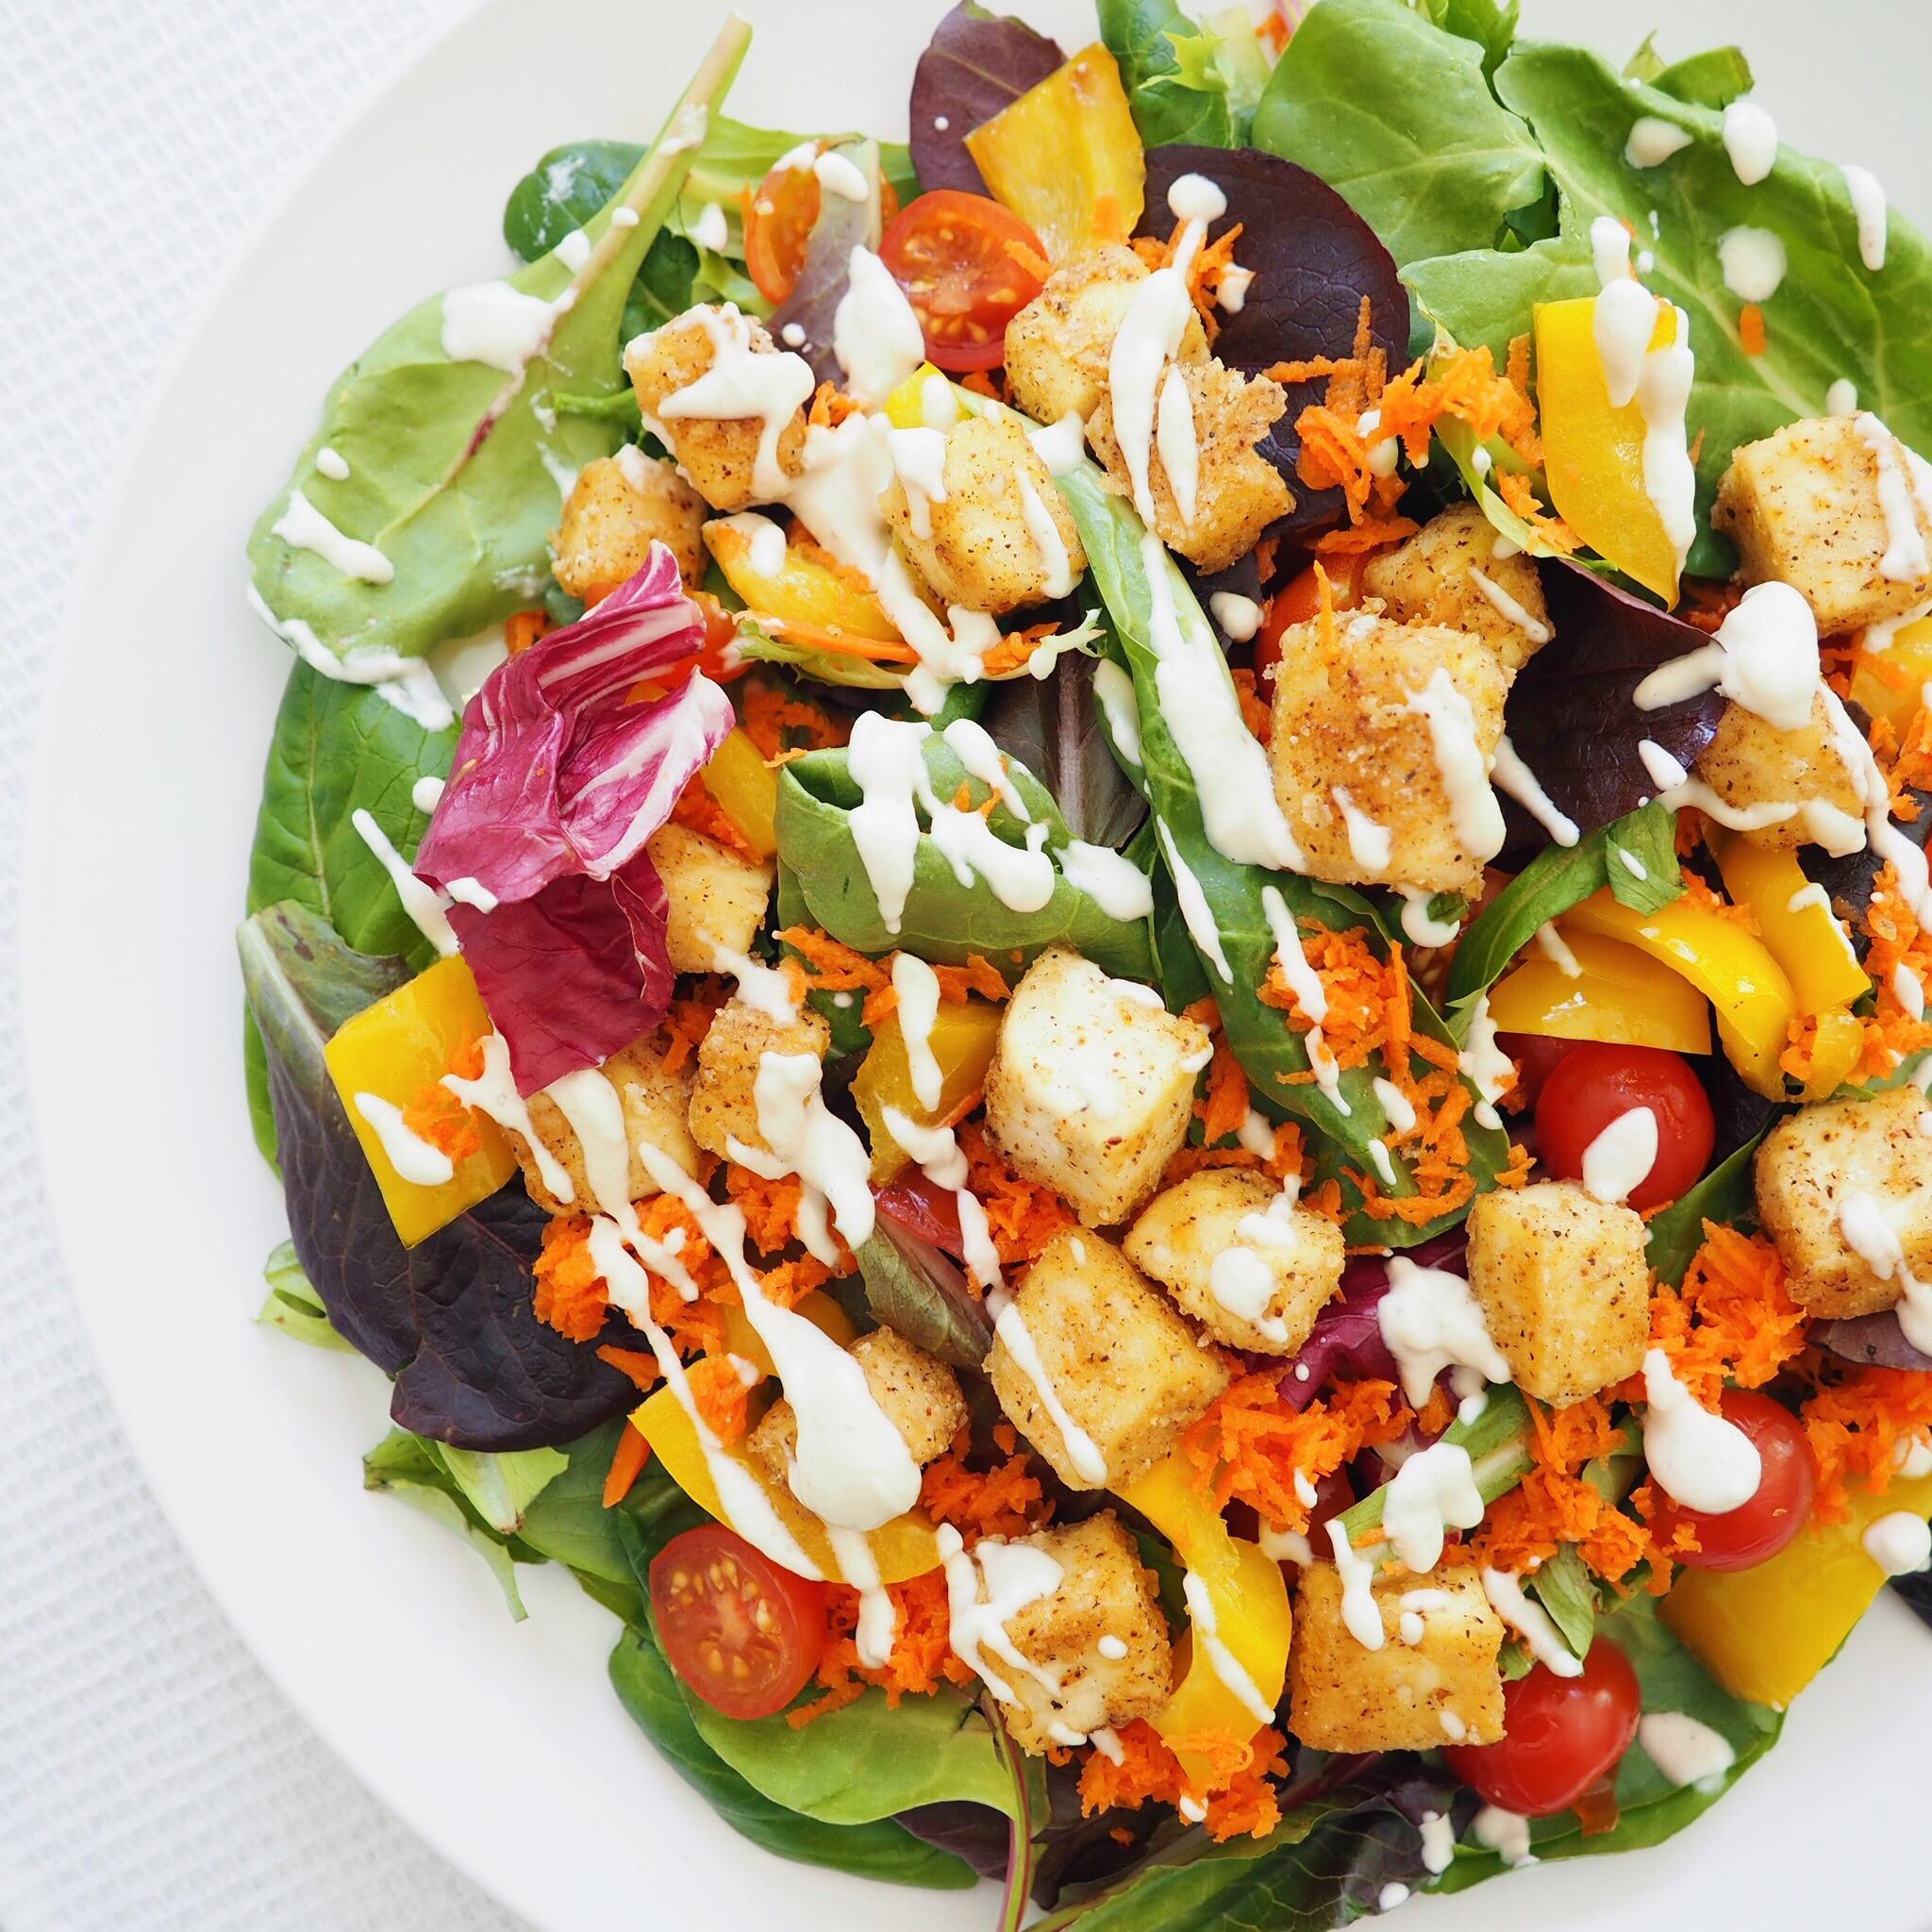 Crispy Tofu Ranch Salad